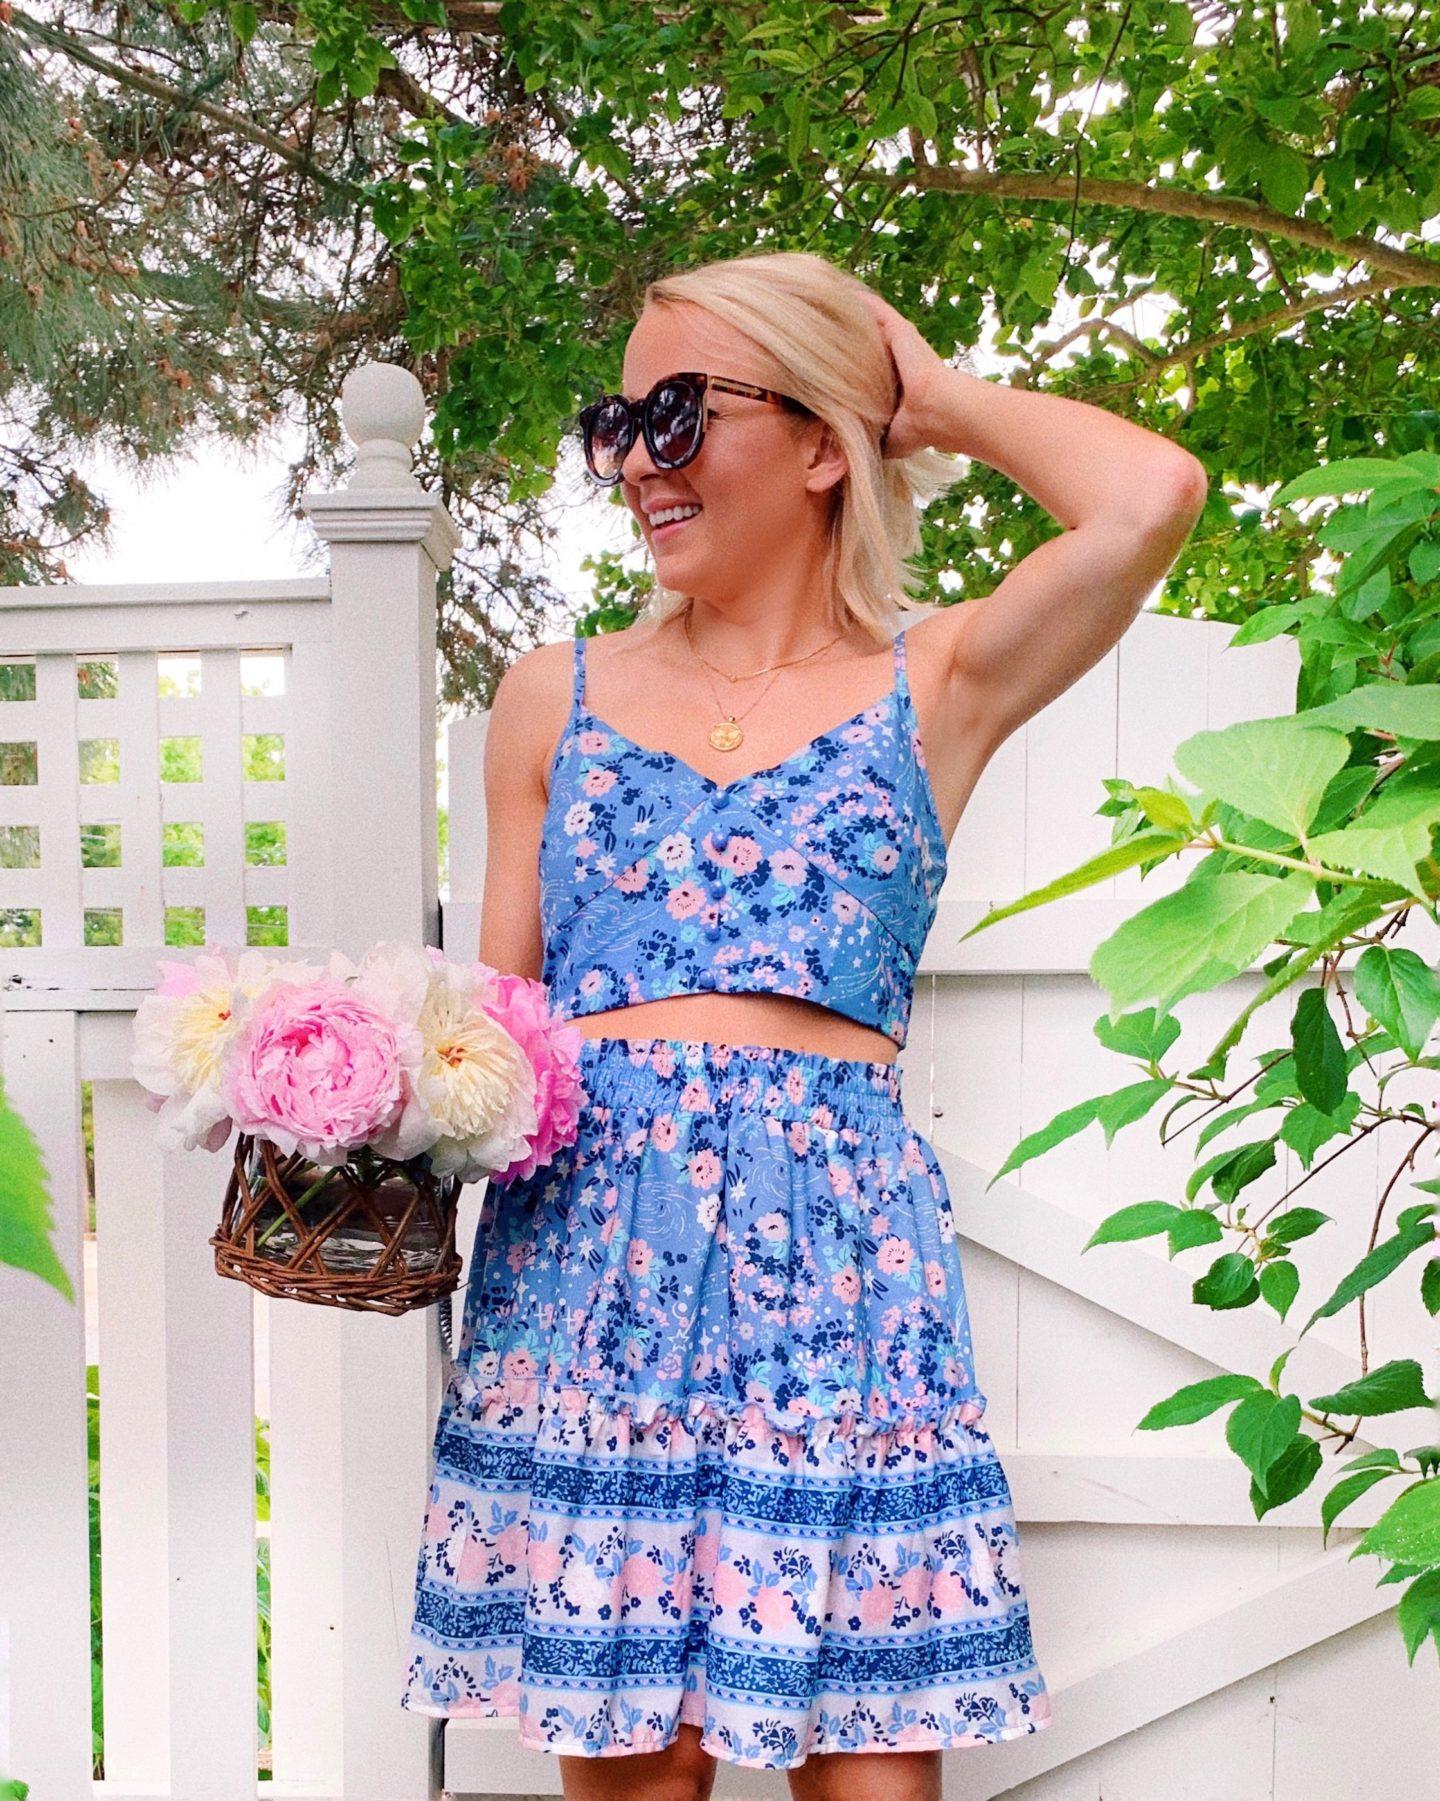 Best June Amazon Prime Fashion Picks